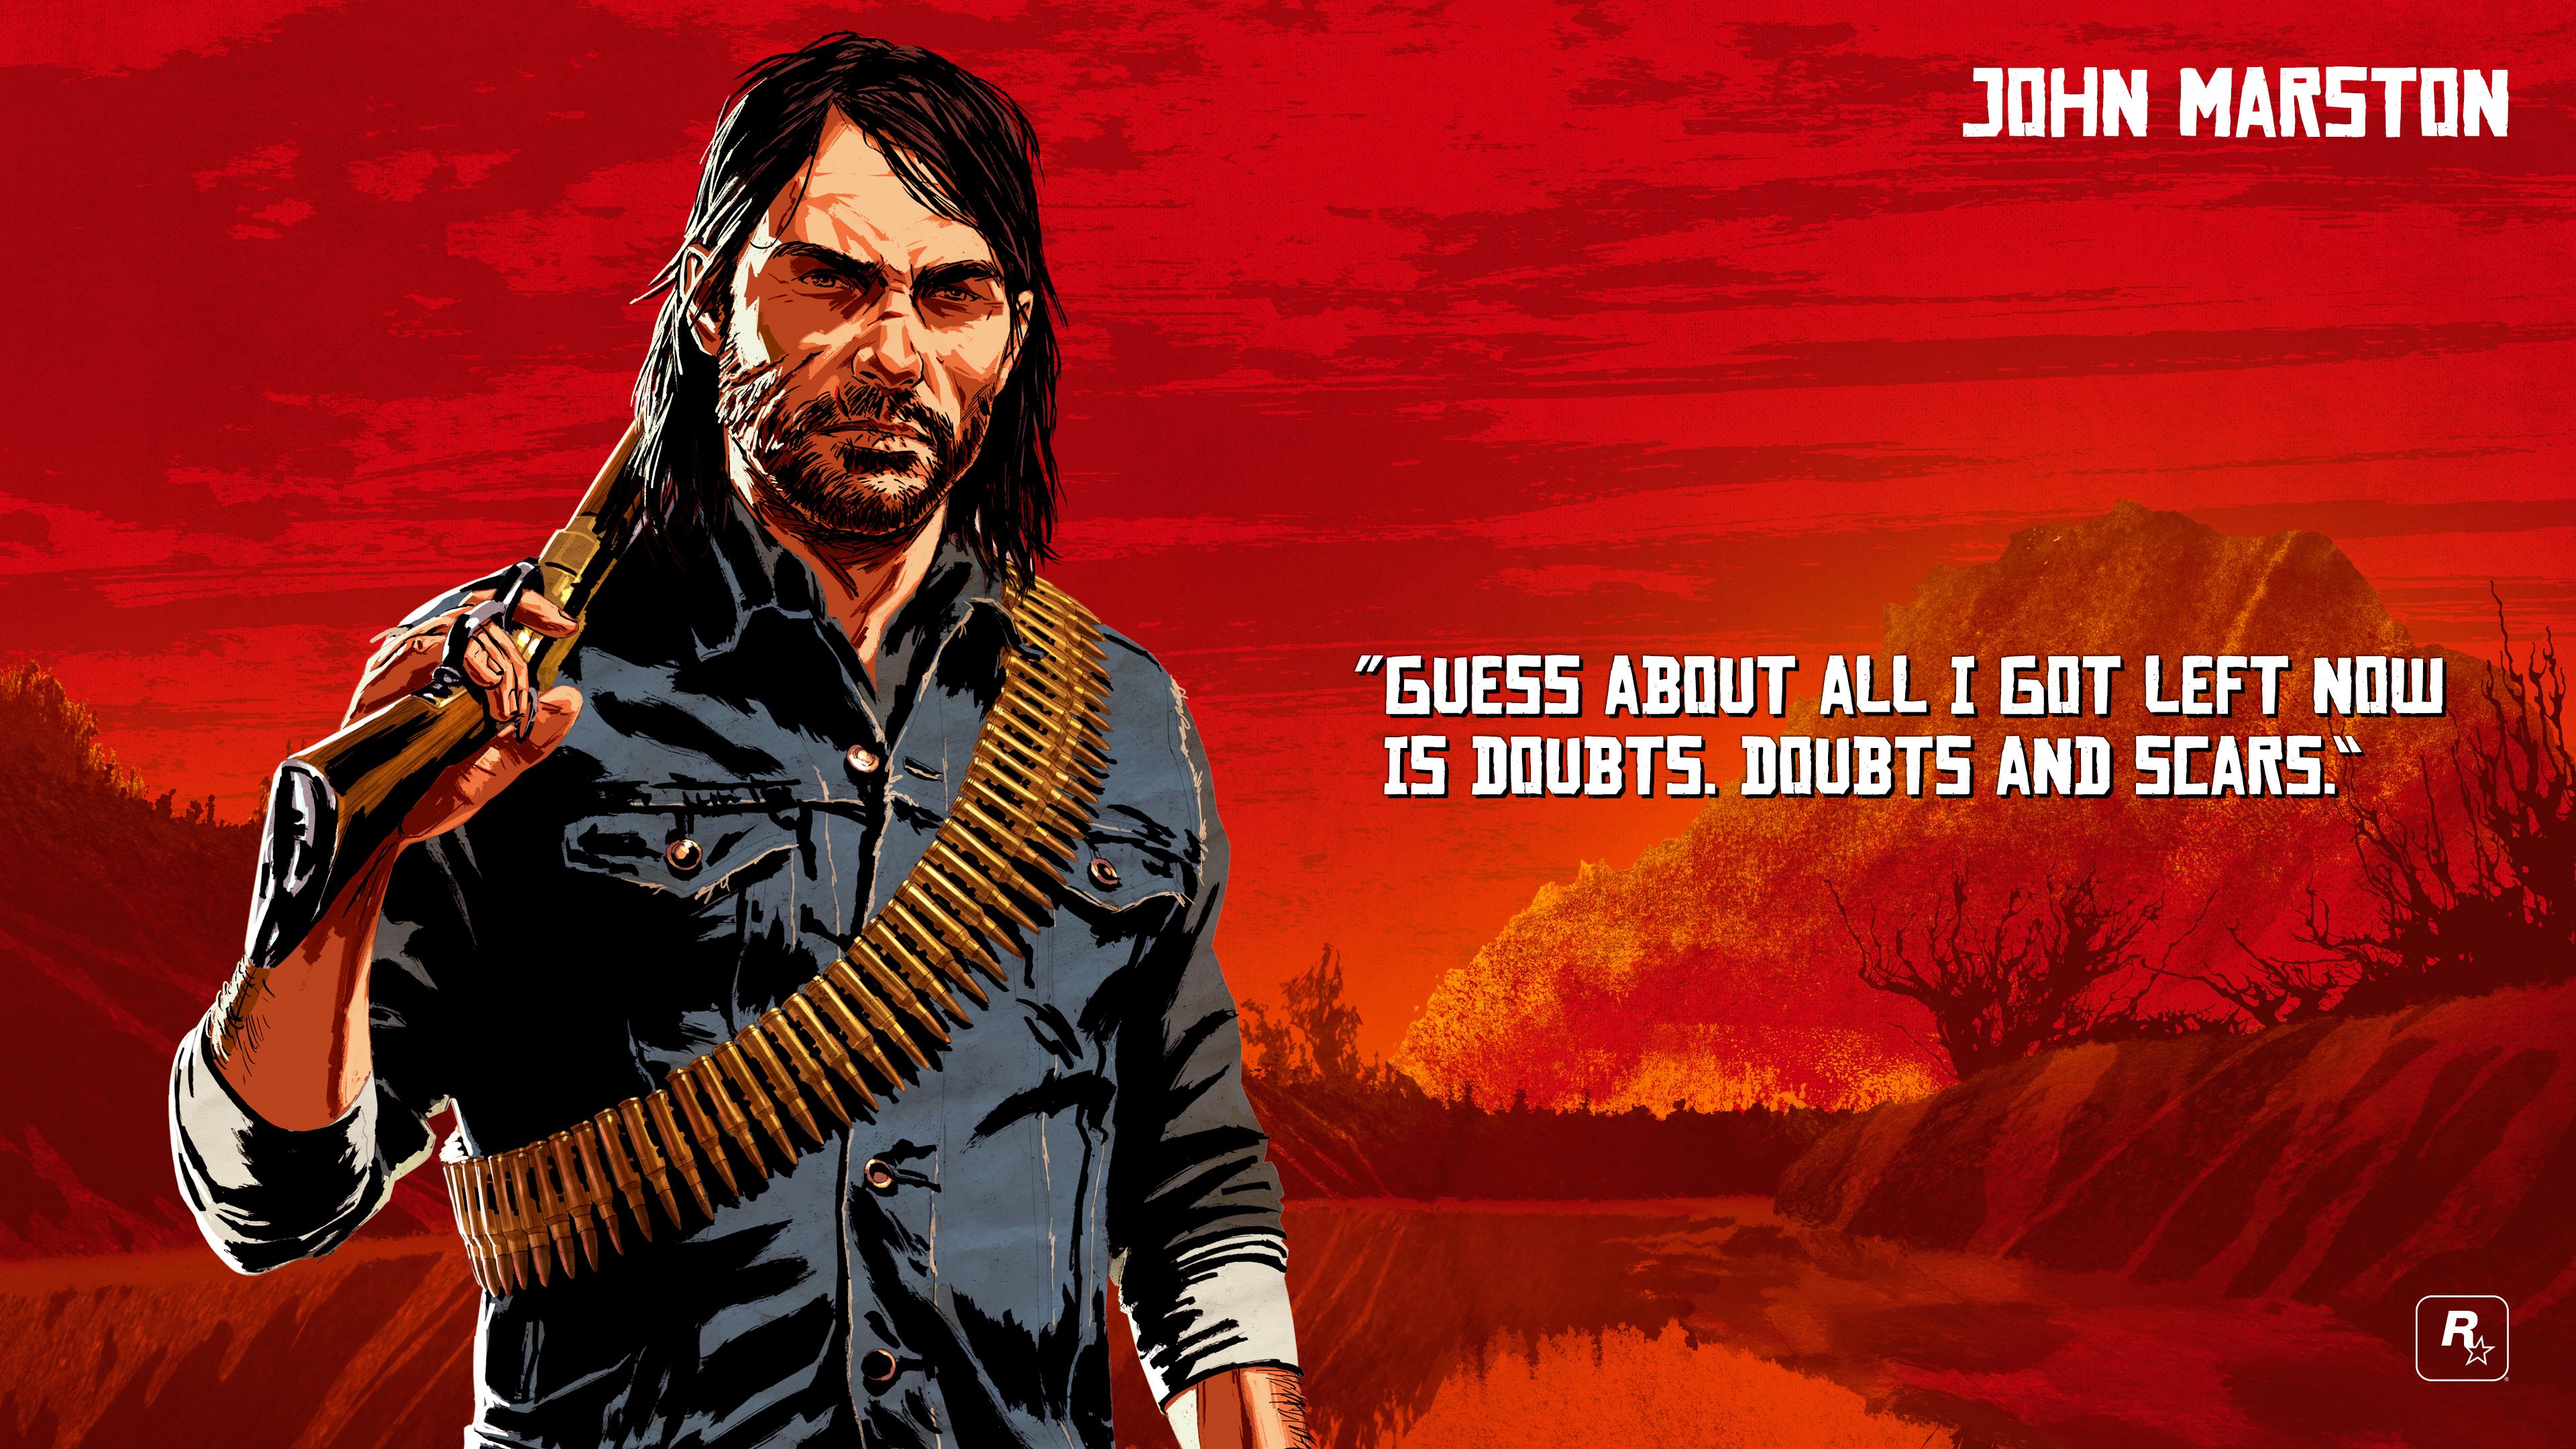 Wallpaper : Rockstar Games, Video game, Video Game Art, penebusan